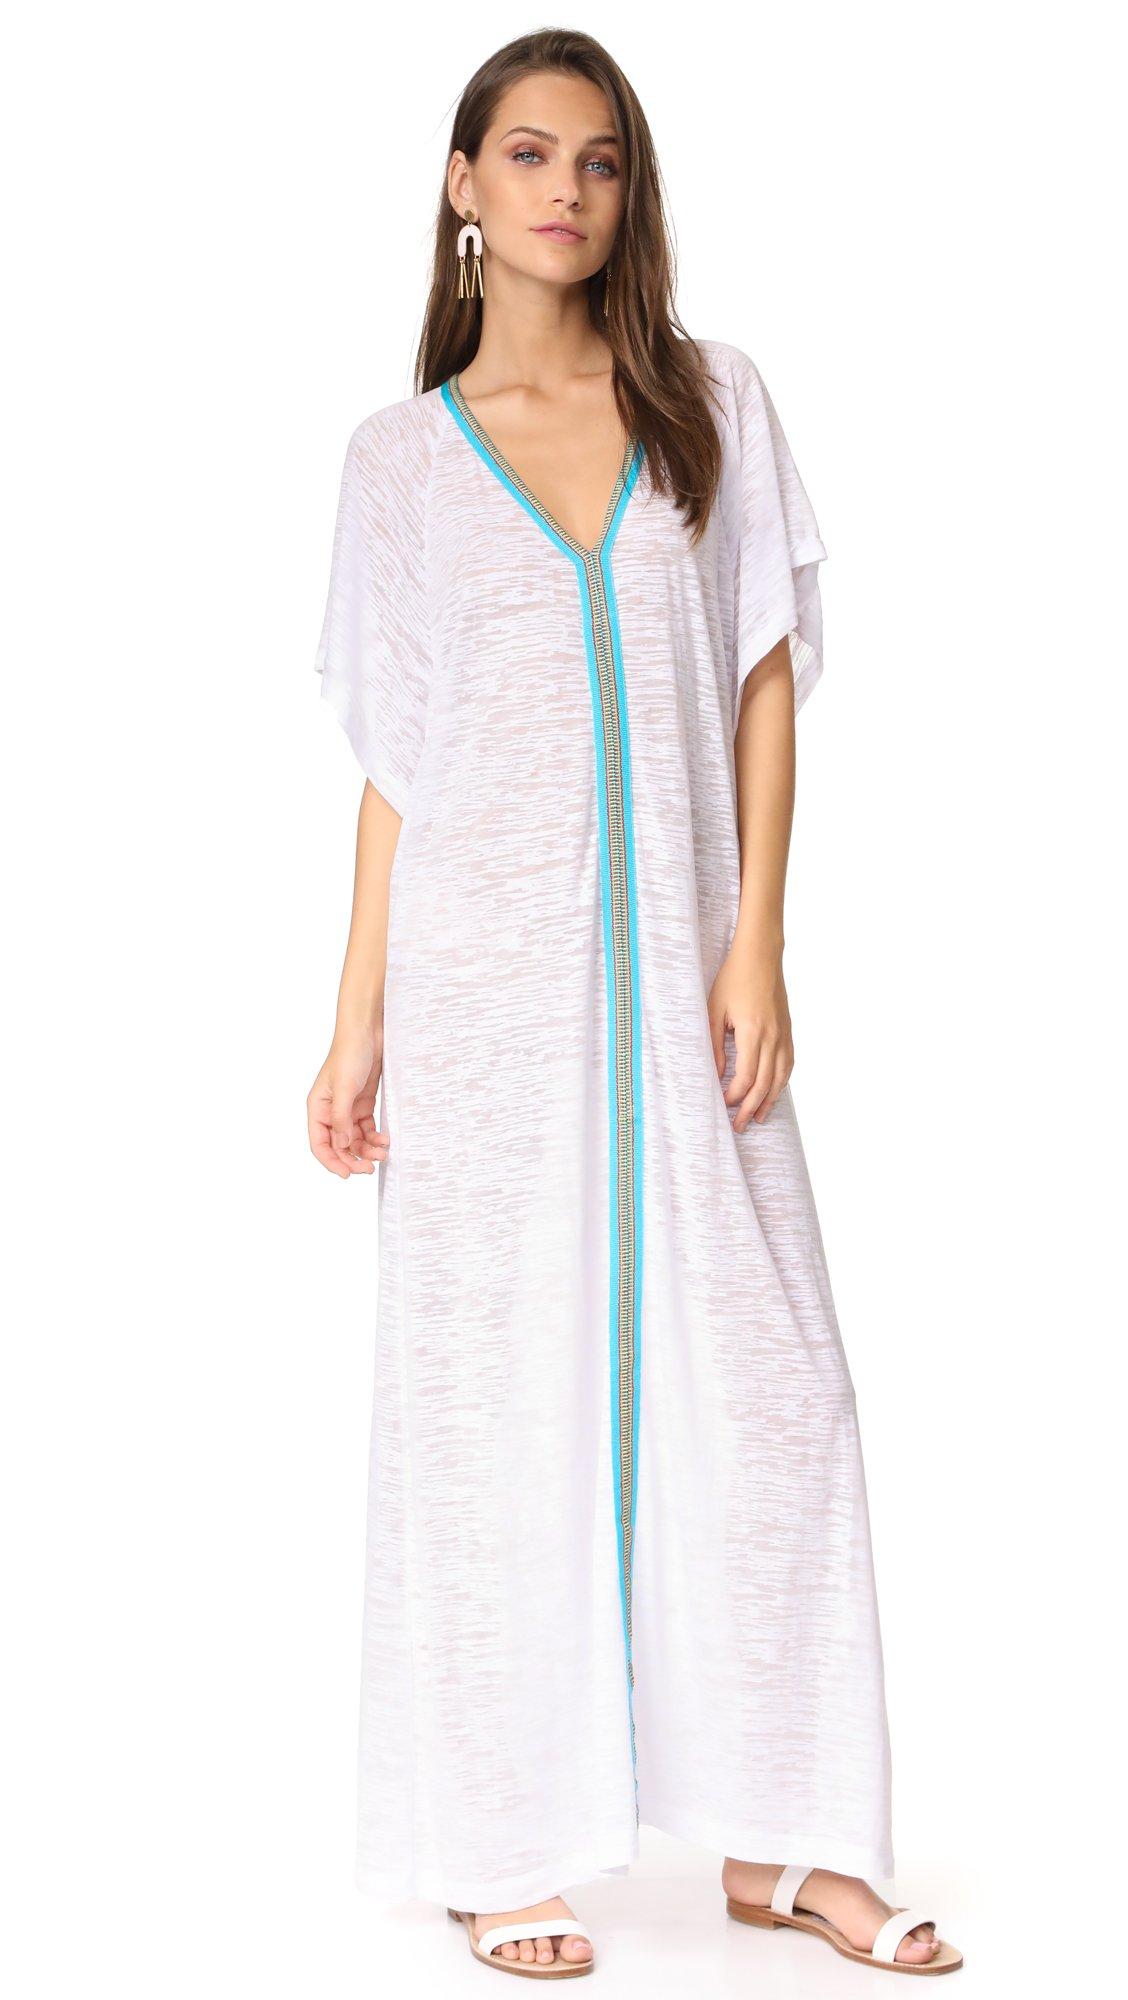 Pitusa Women's Abaya Maxi Dress, White, One Size